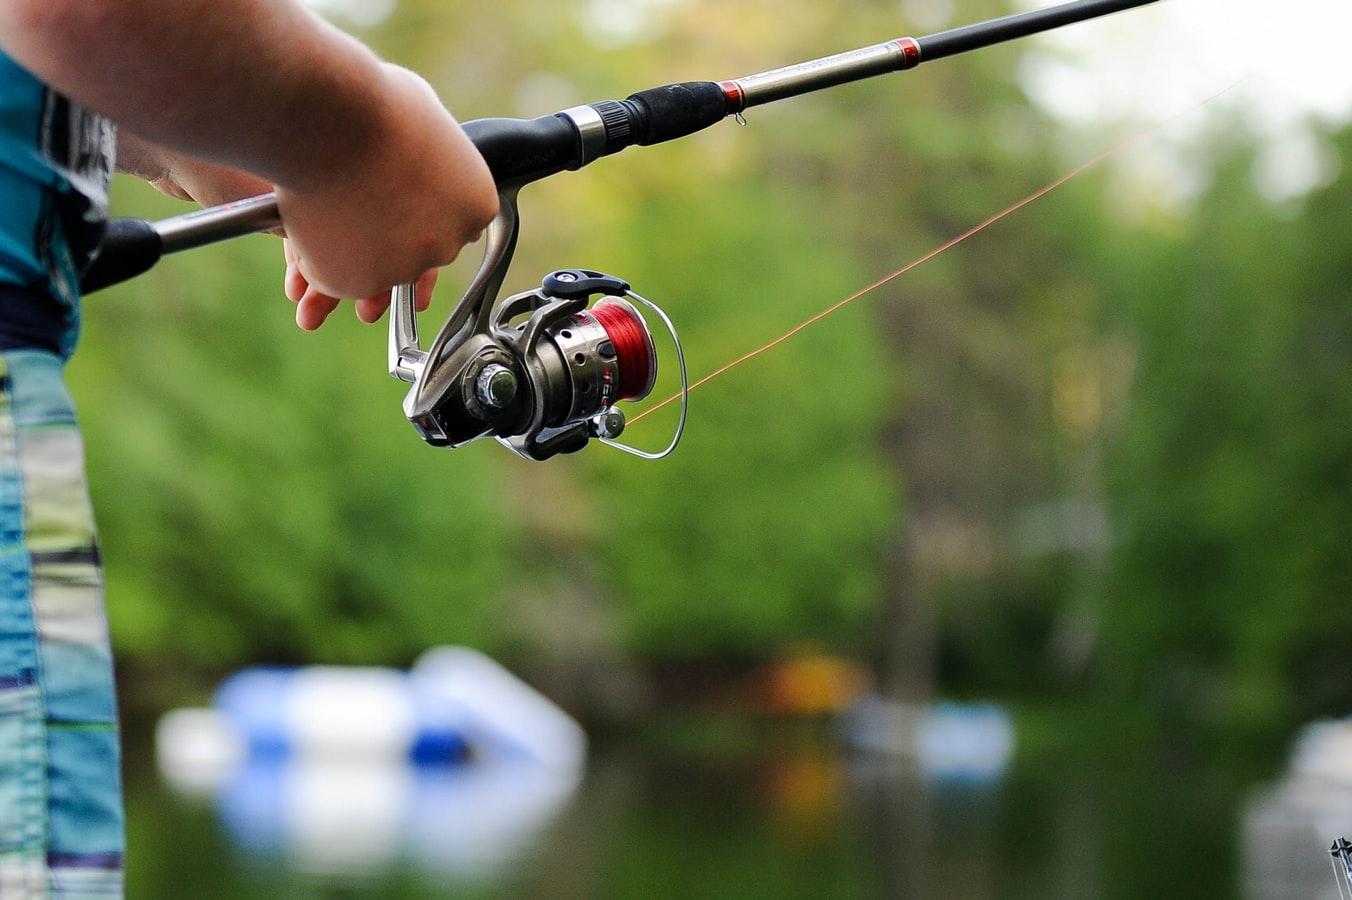 Man holds fishing rod. (via unsplash.com)